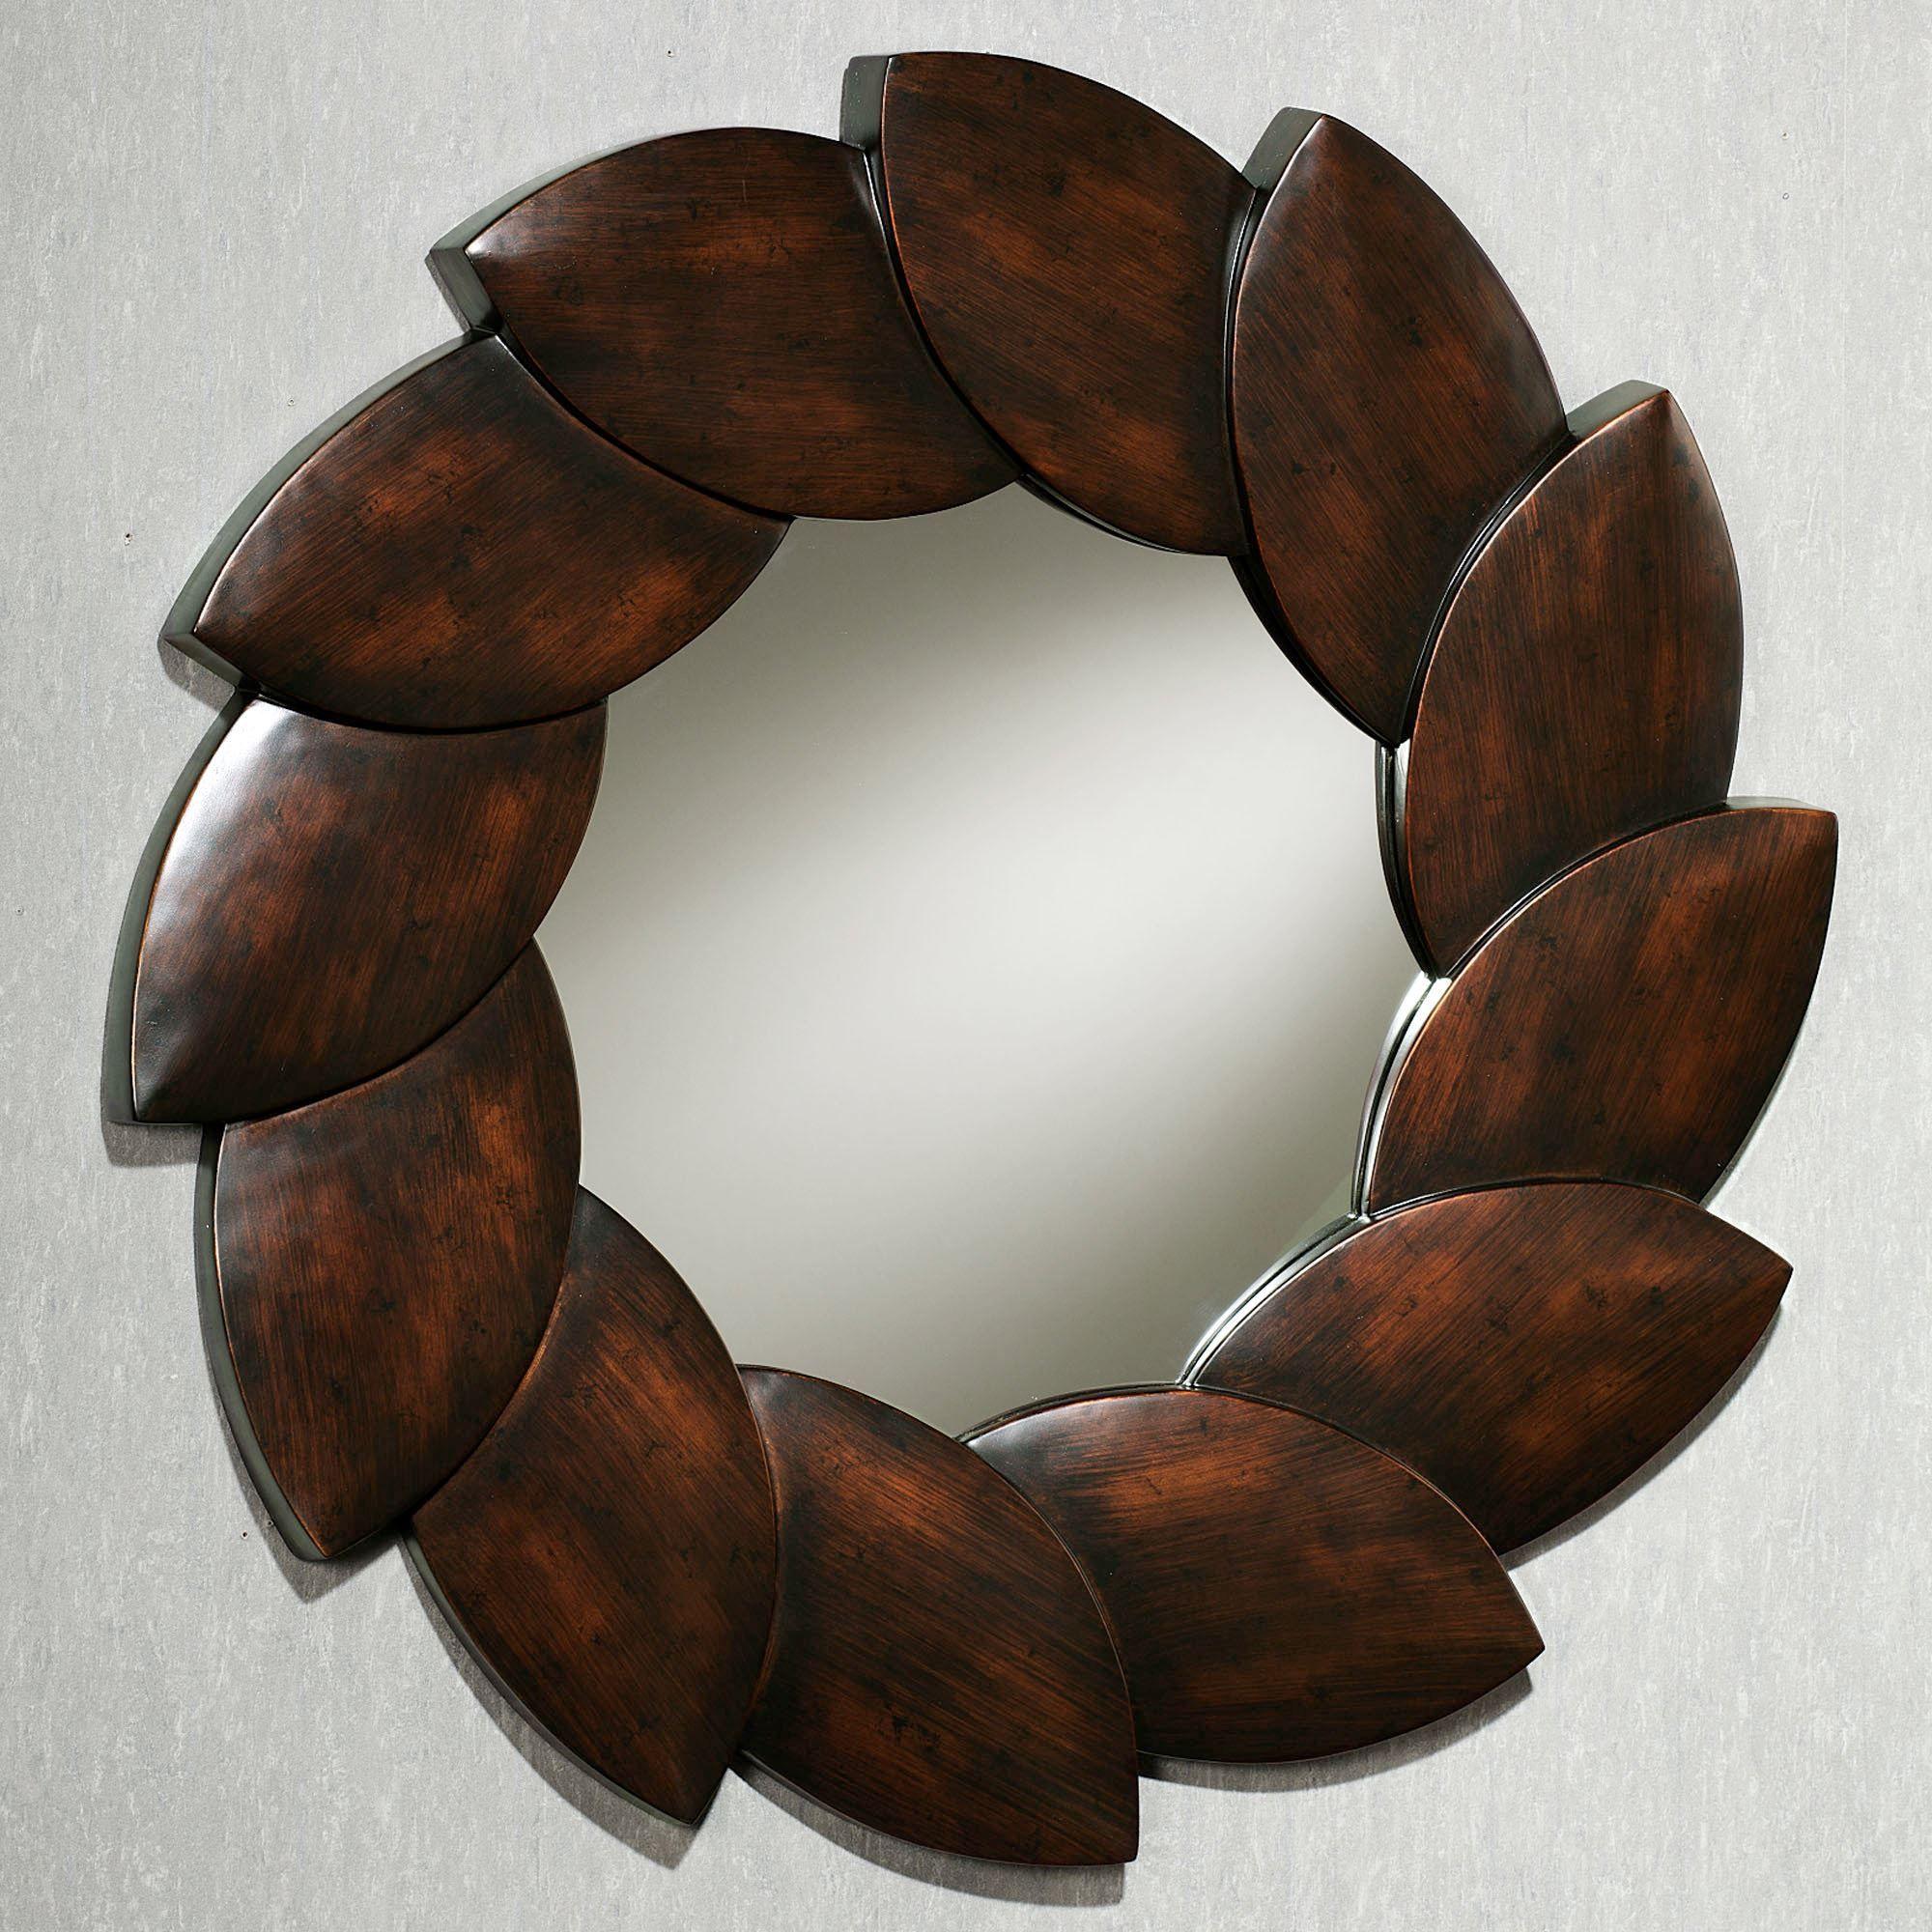 Ovalis Leaf Wall Mirror